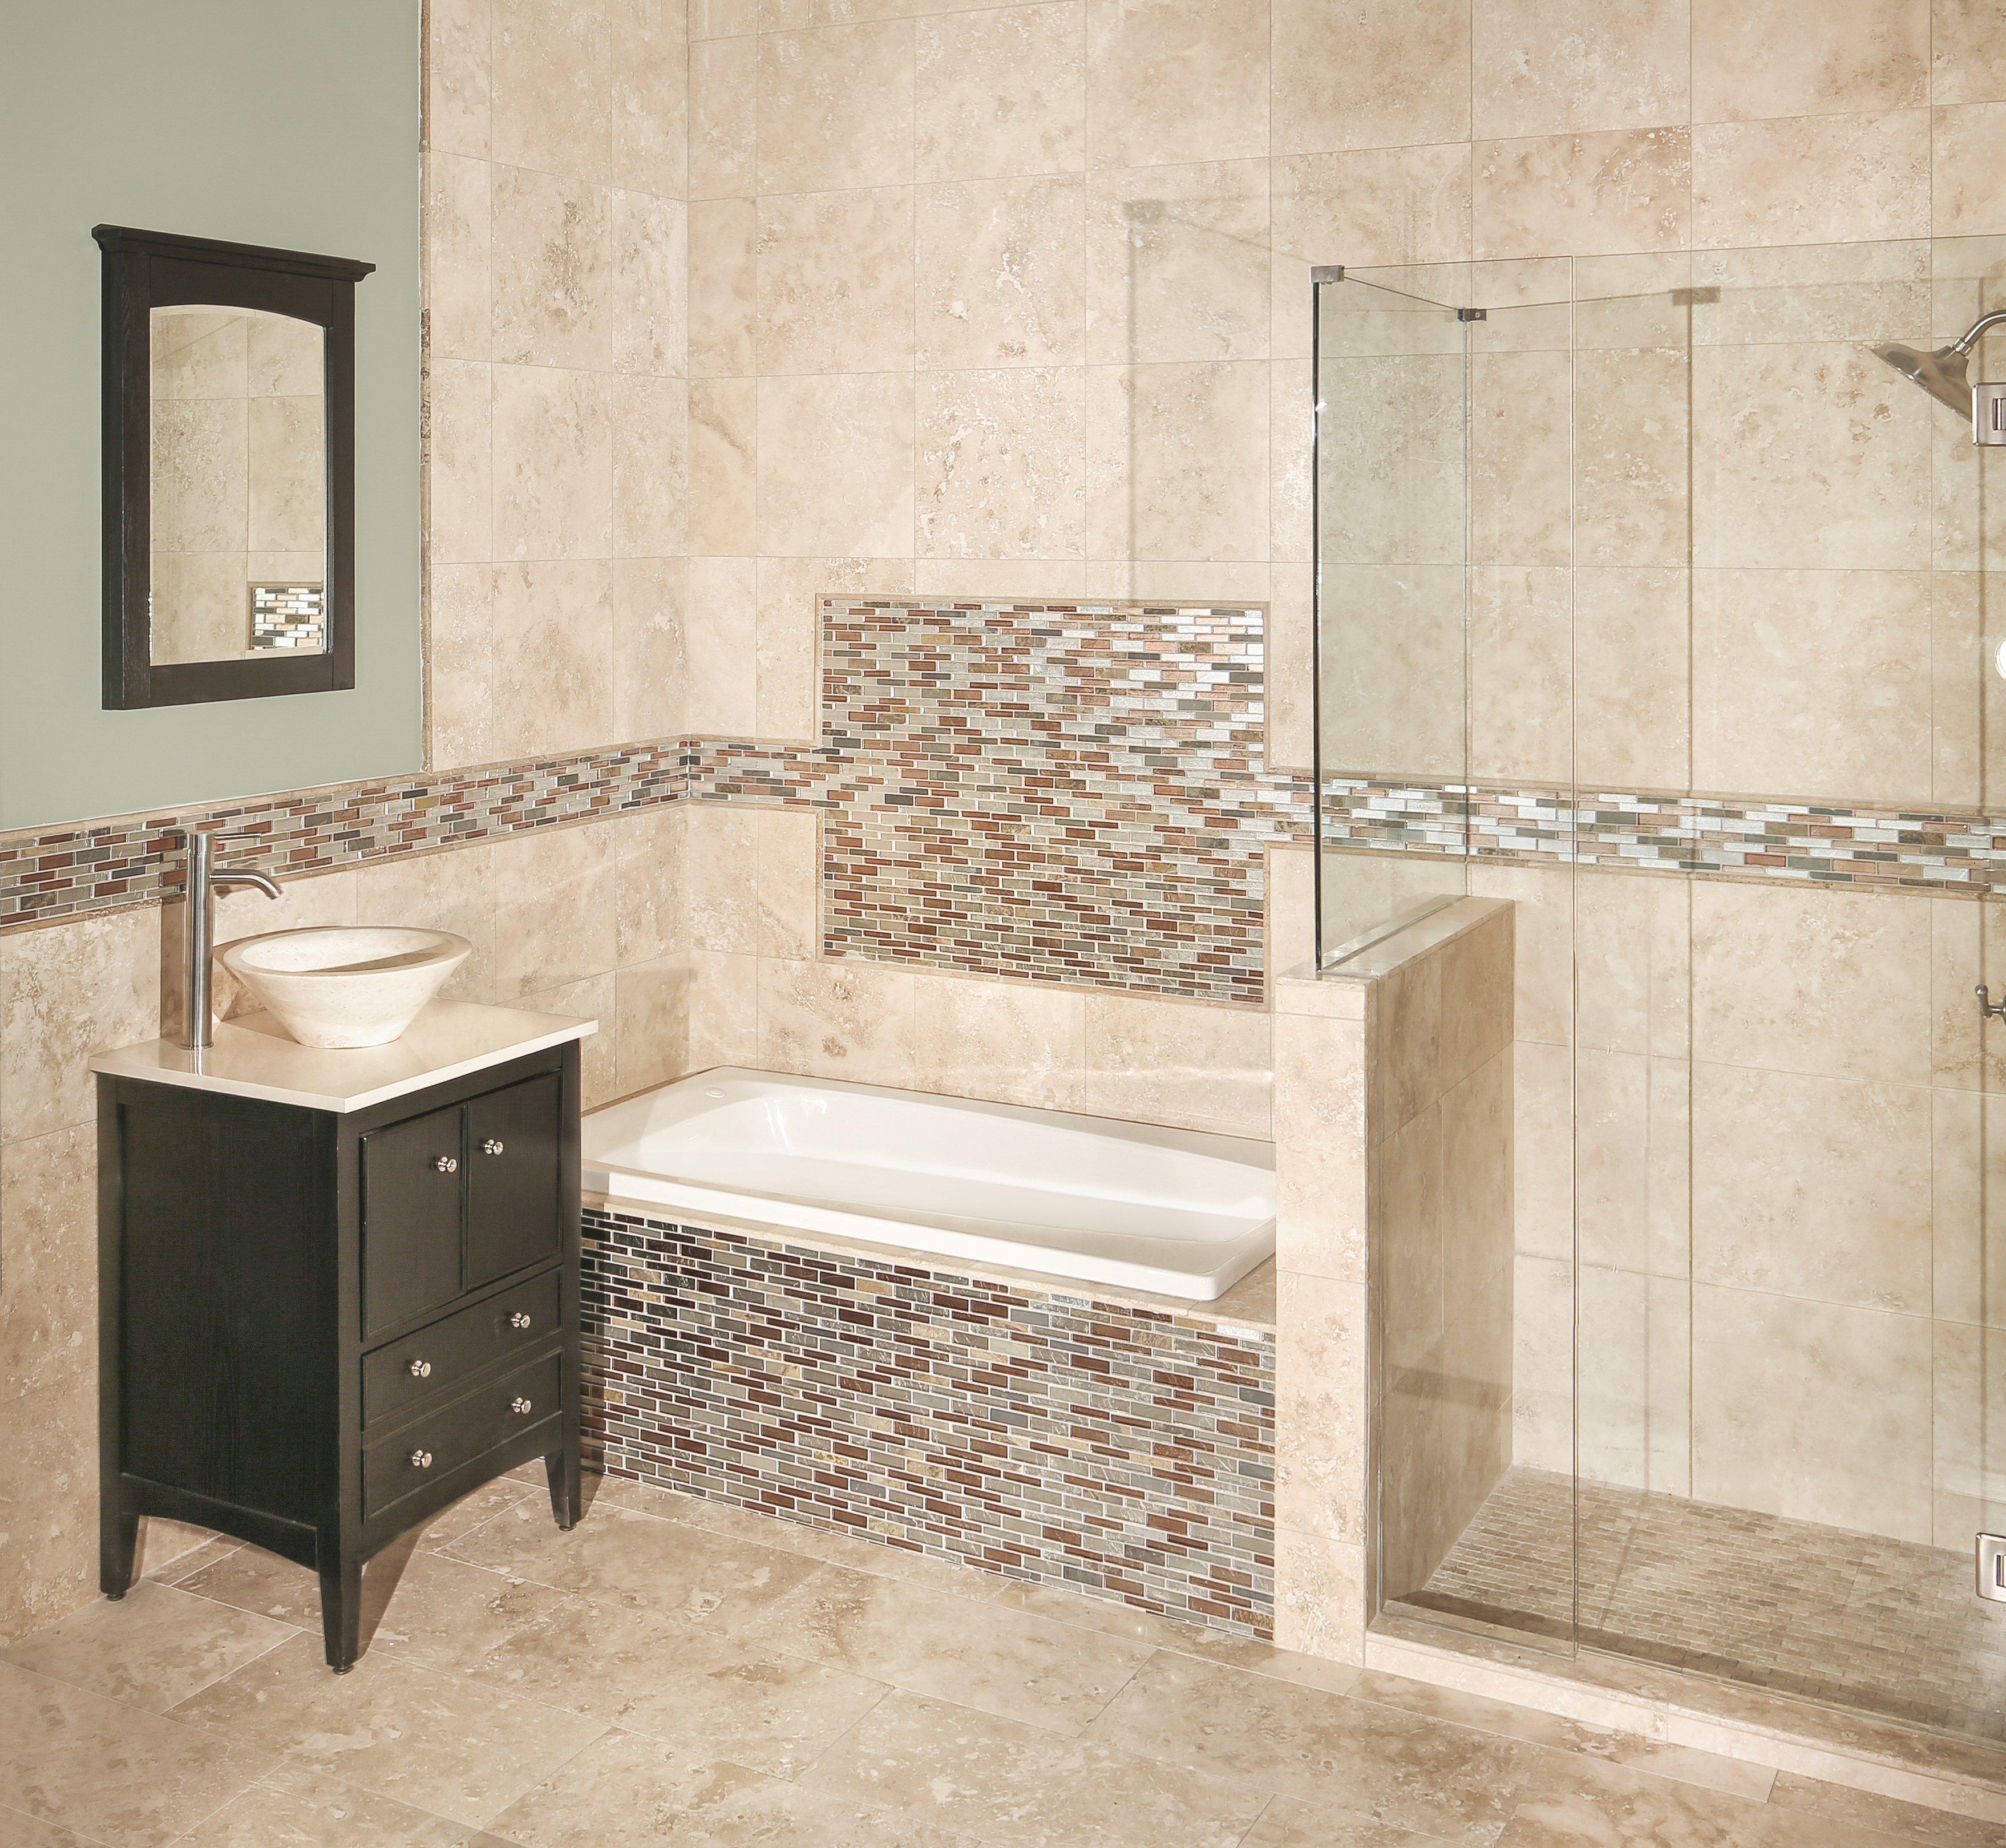 Bathroom Pictures Gallery Home Decoration Interior Design